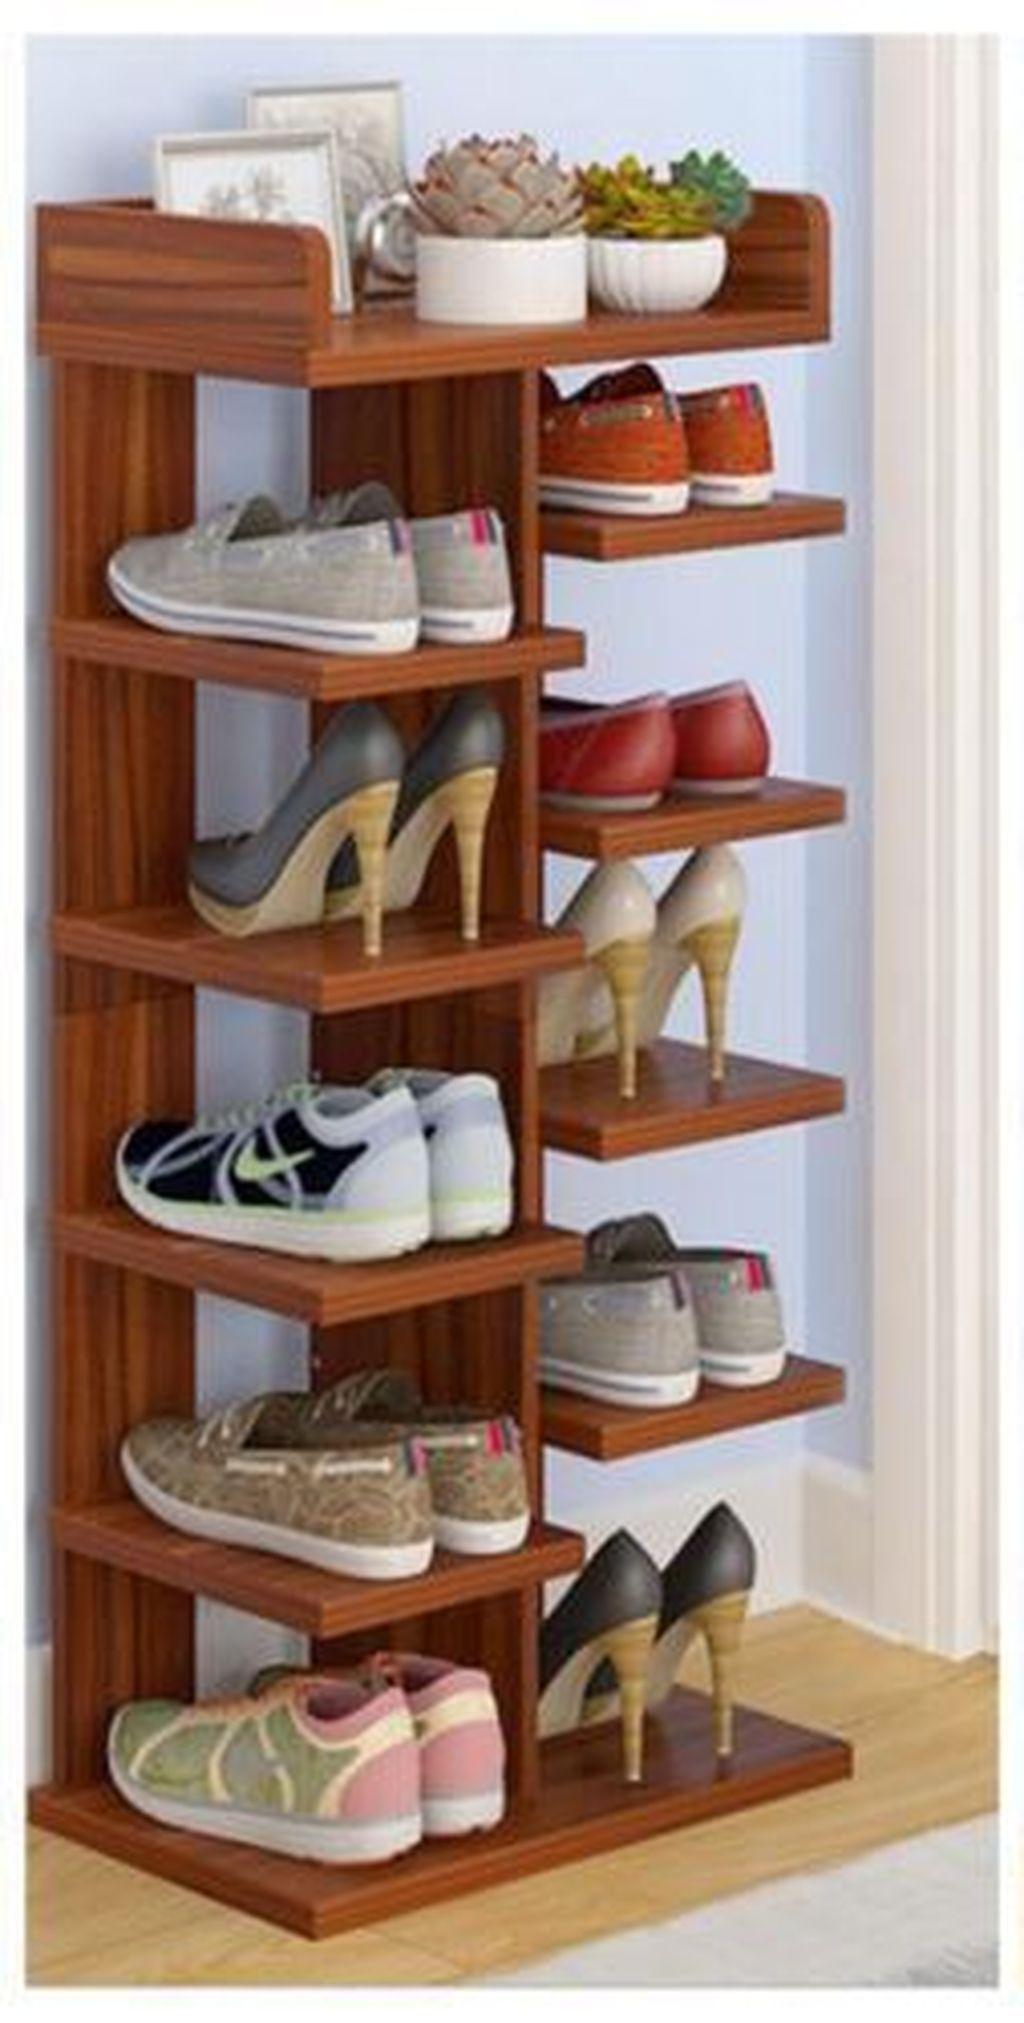 36 Delightful Diy Shoe Rack Design Ideas To Keep Your Shoes Nicely En 2020 Idees Etageres Mobilier De Salon Meuble Mural